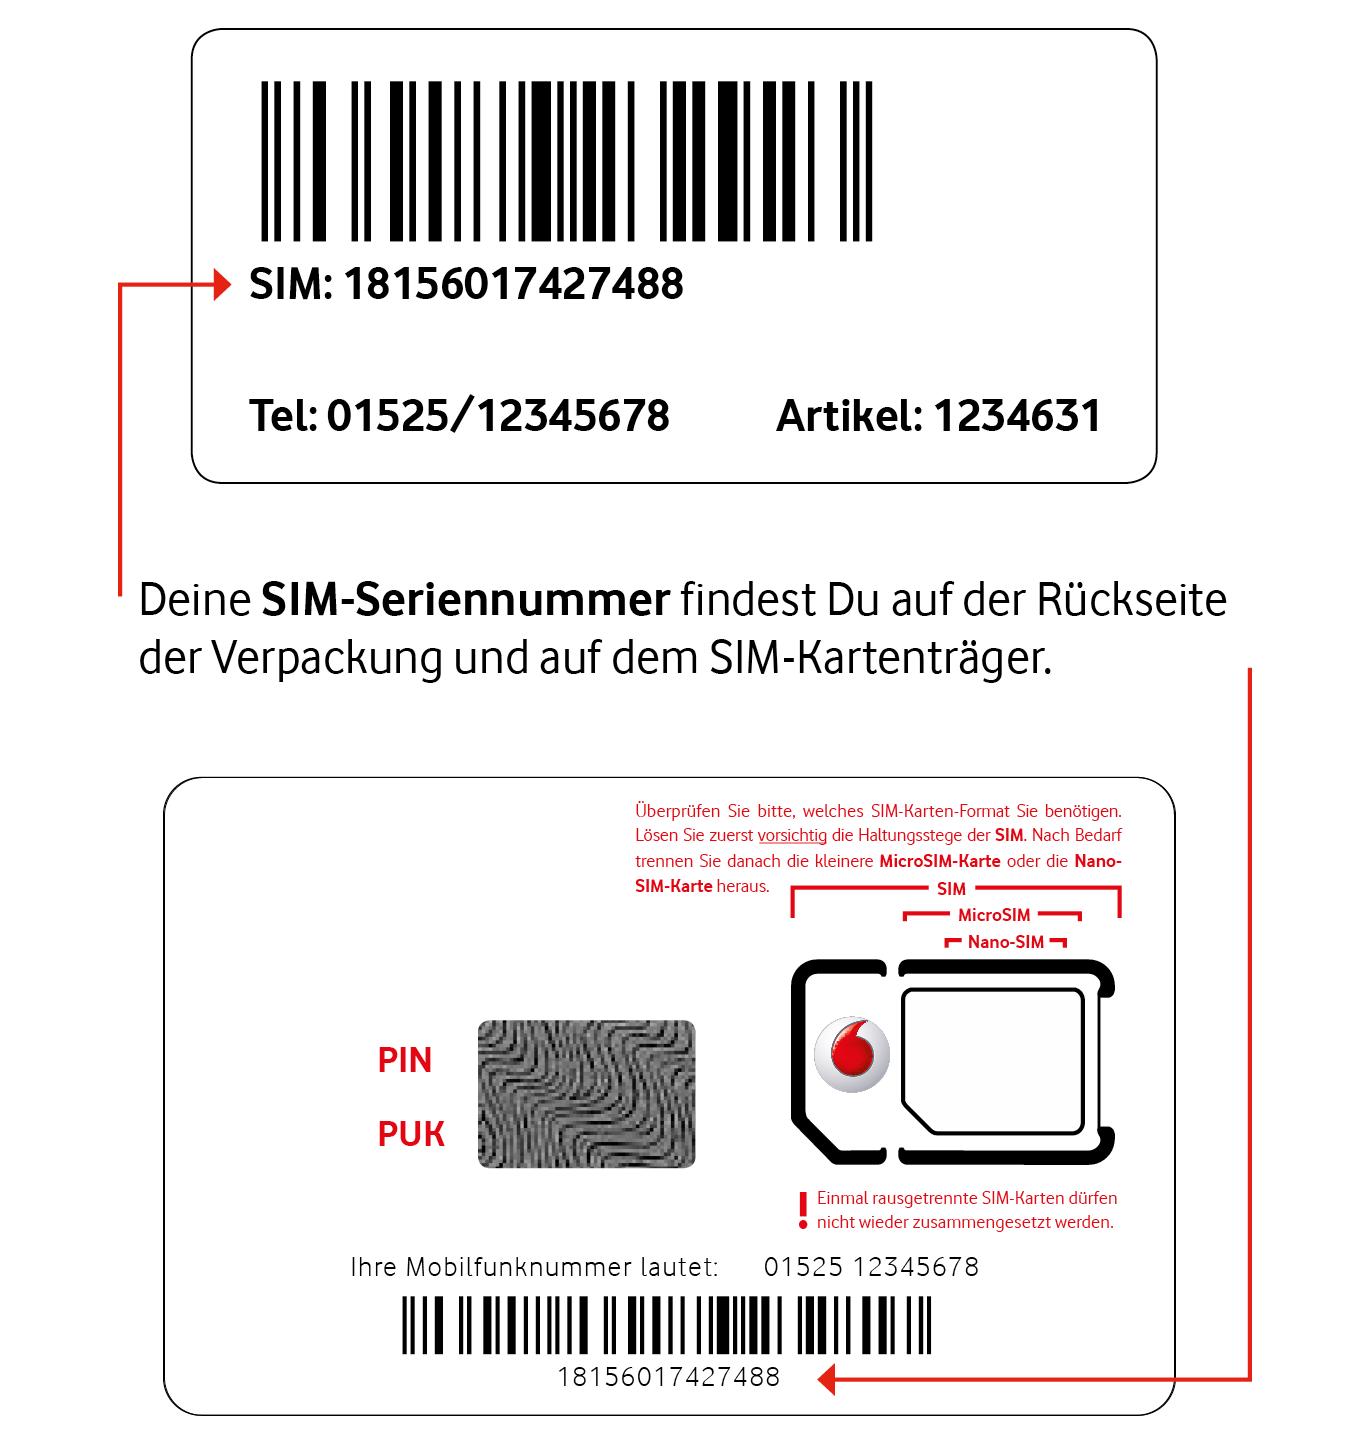 Vodafone Sim Karte Aktivieren.Callya Sim Karte Aktivieren Und Registrieren Vodafone